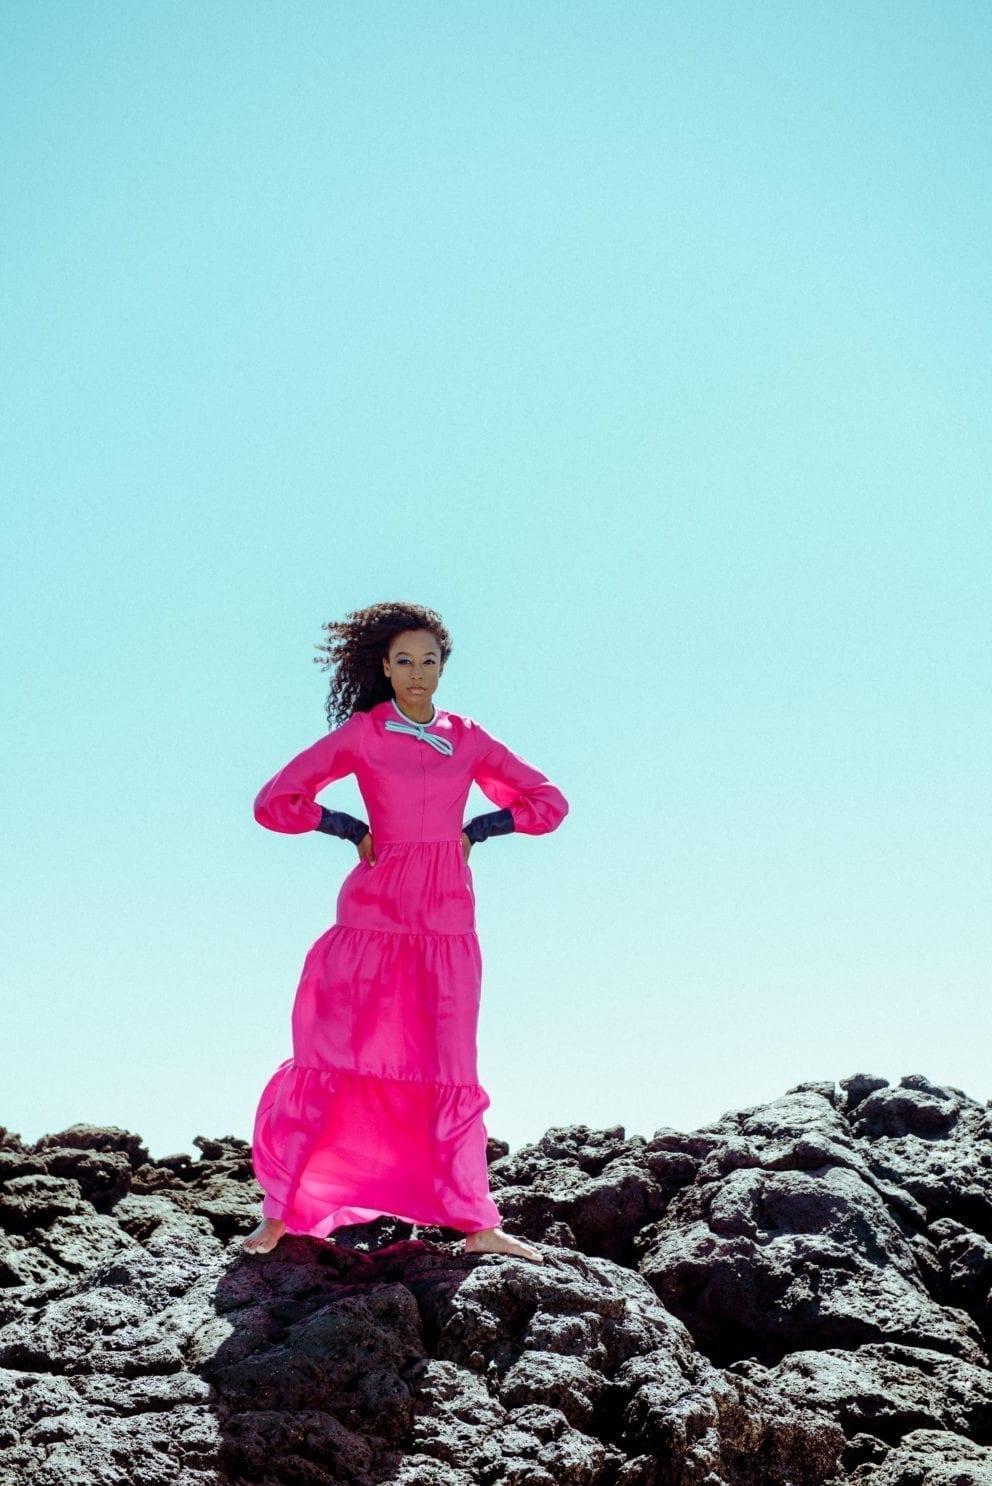 Corinne Bailey Rae in pink dress standing against blue sky on rocks